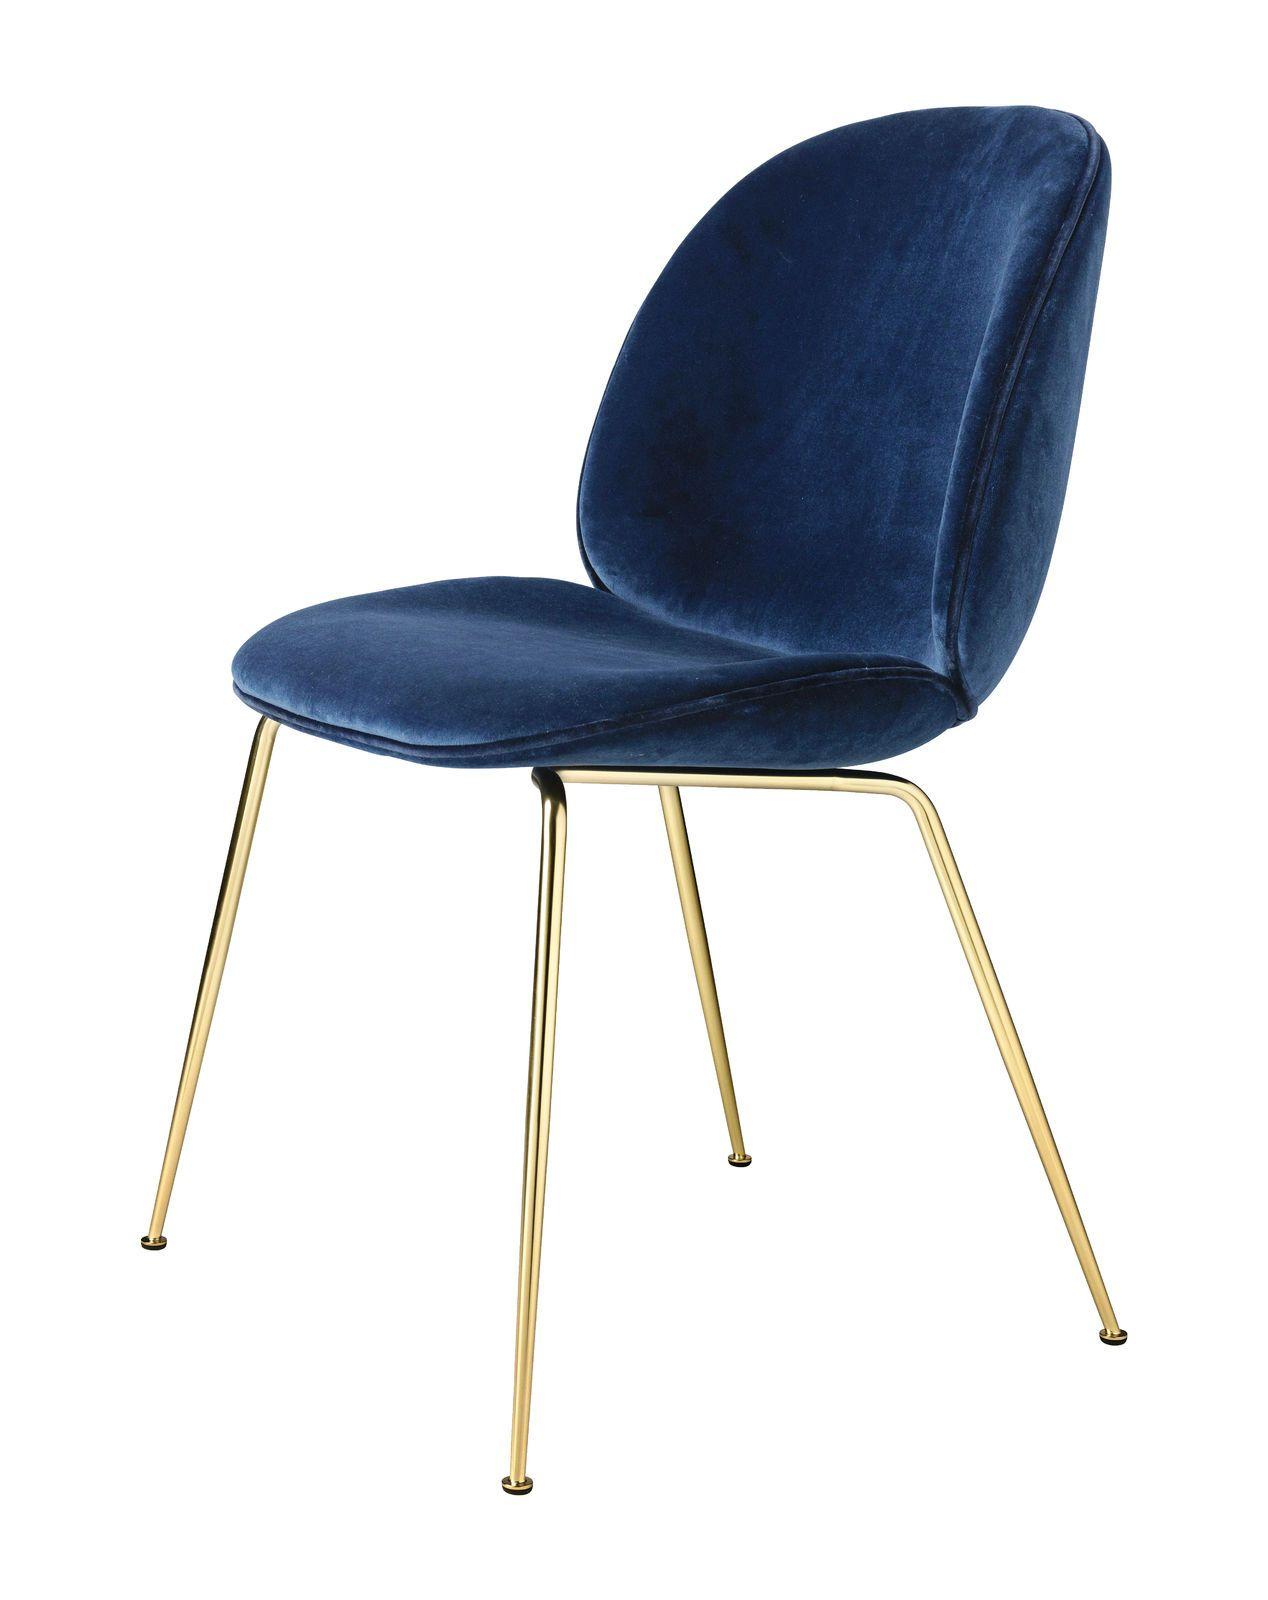 GUBI // Beetle Chair By GamFratesi ☆ Join Our Pinterest